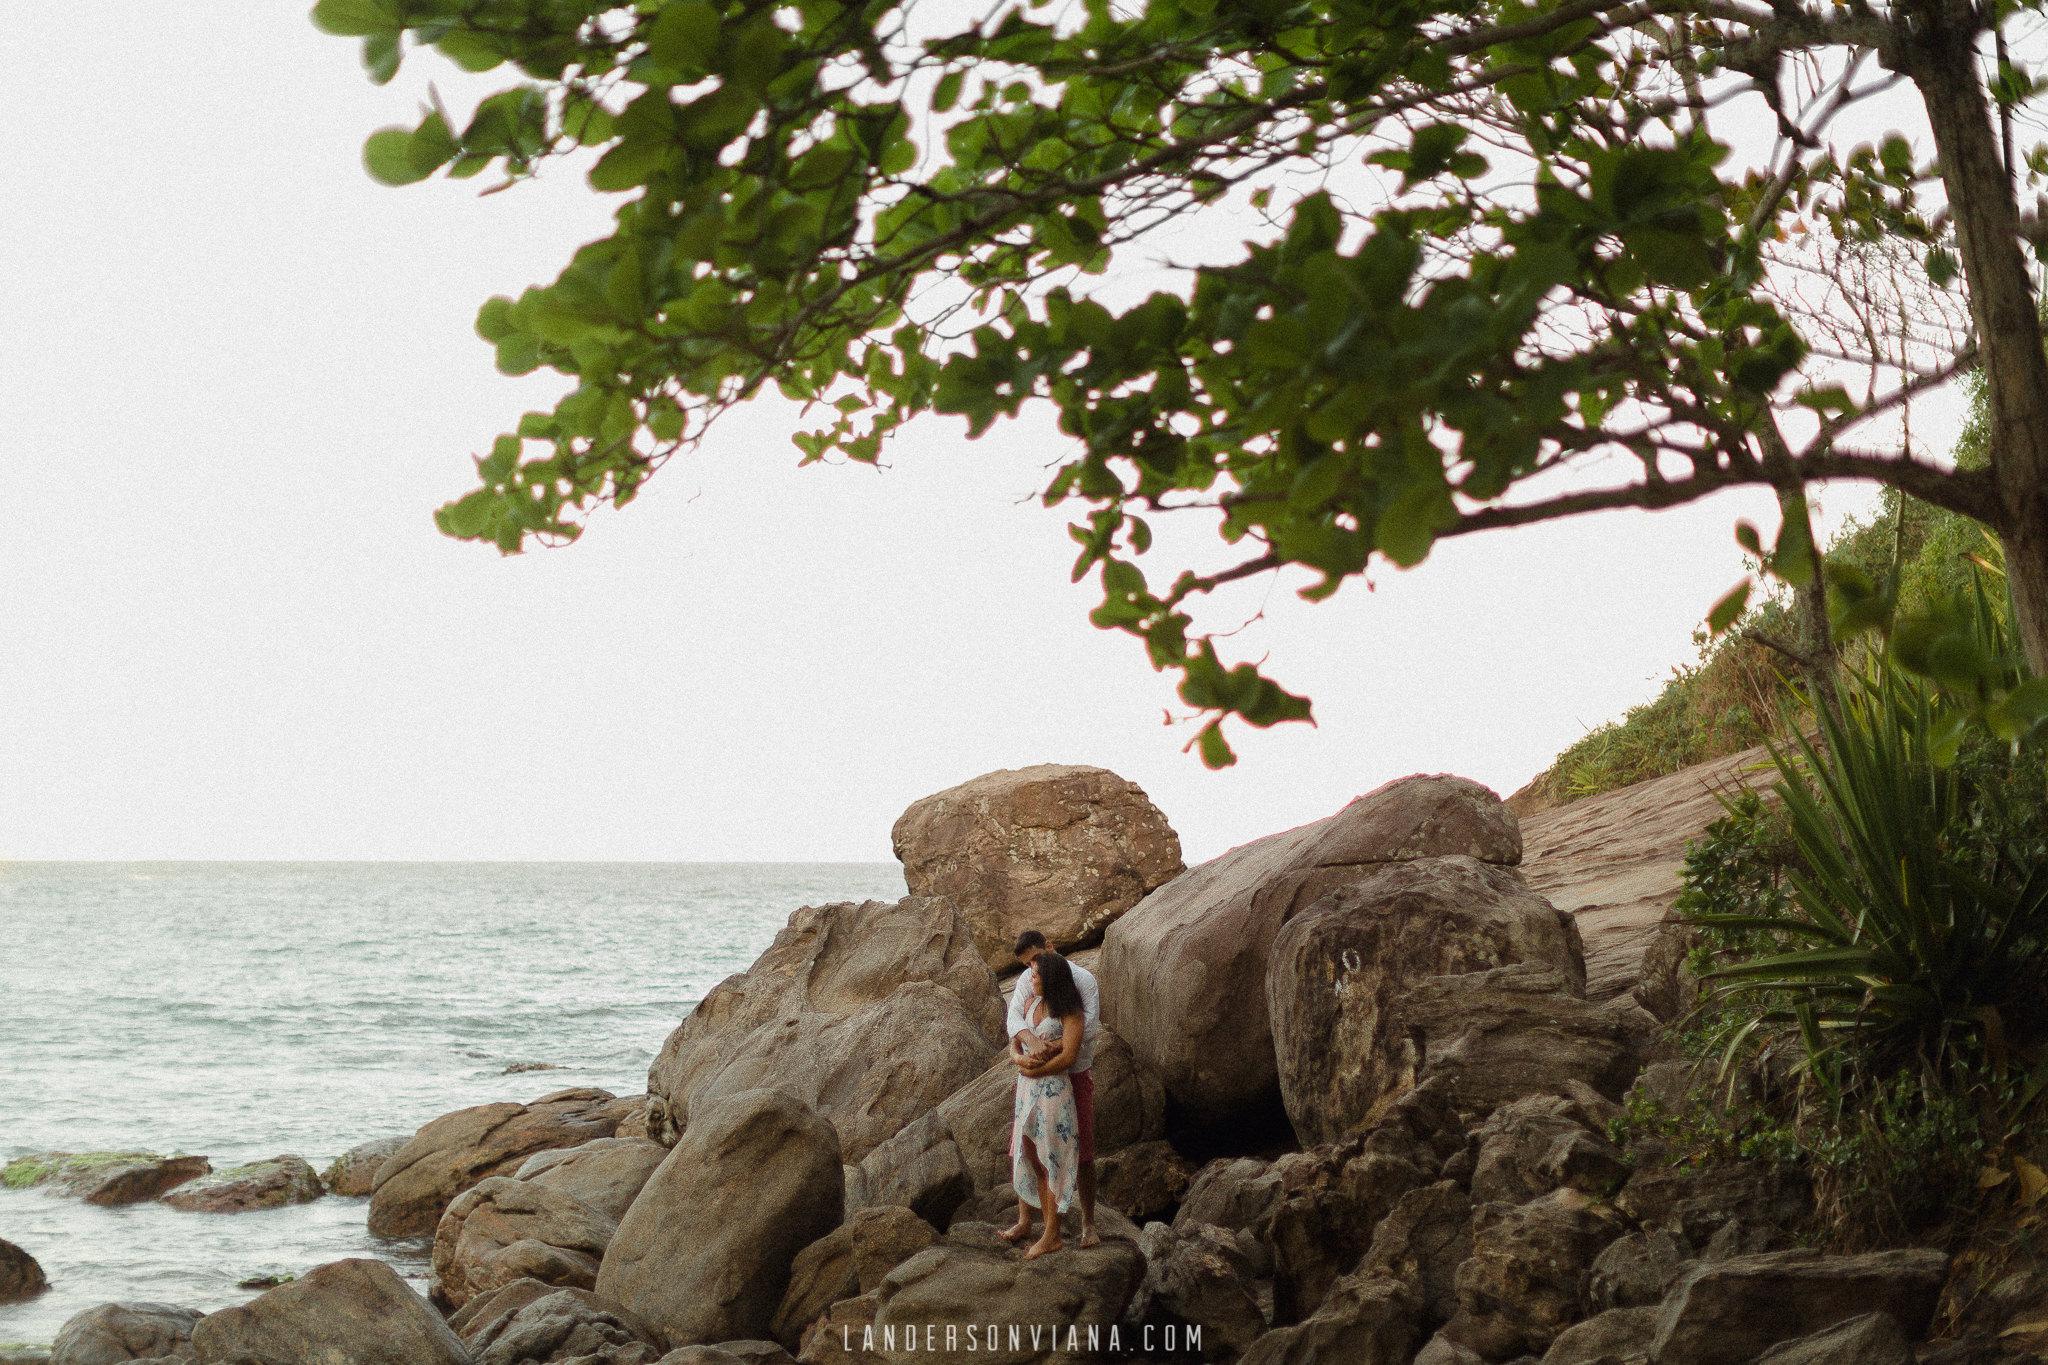 ensaio-pre-wedding-praia-landerson-viana-fotografia-casamento-pegueiobouquet-21.jpg